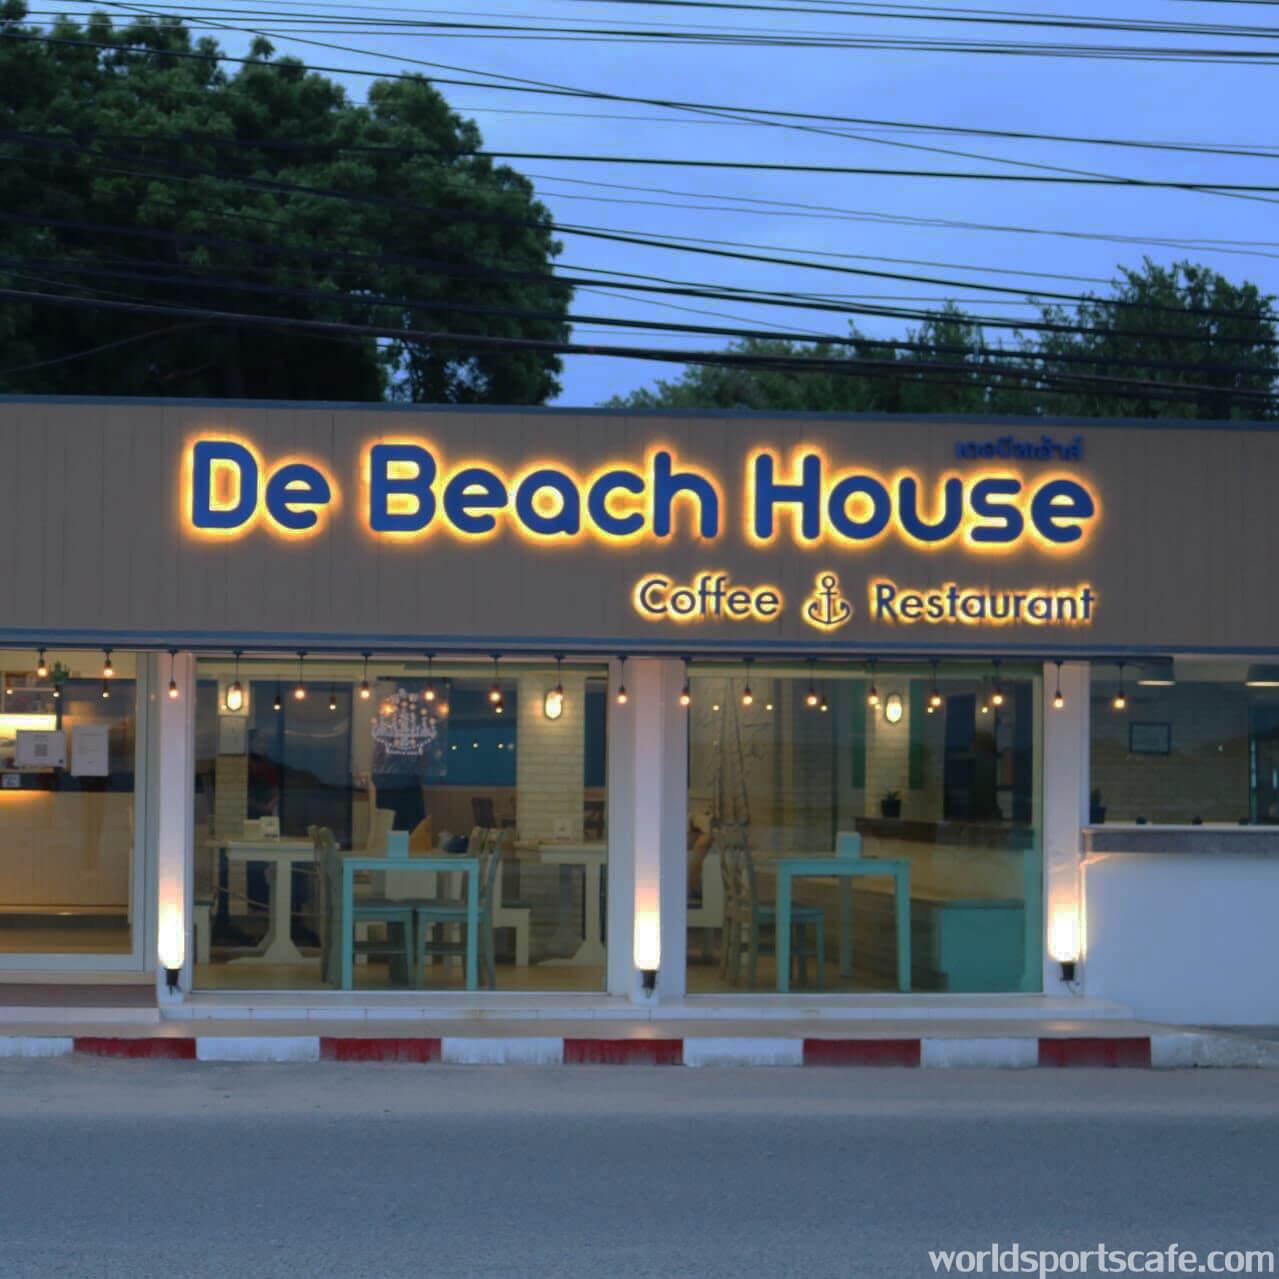 De Beach House คาเฟ่ริมทะเล ที่สัตหีบ